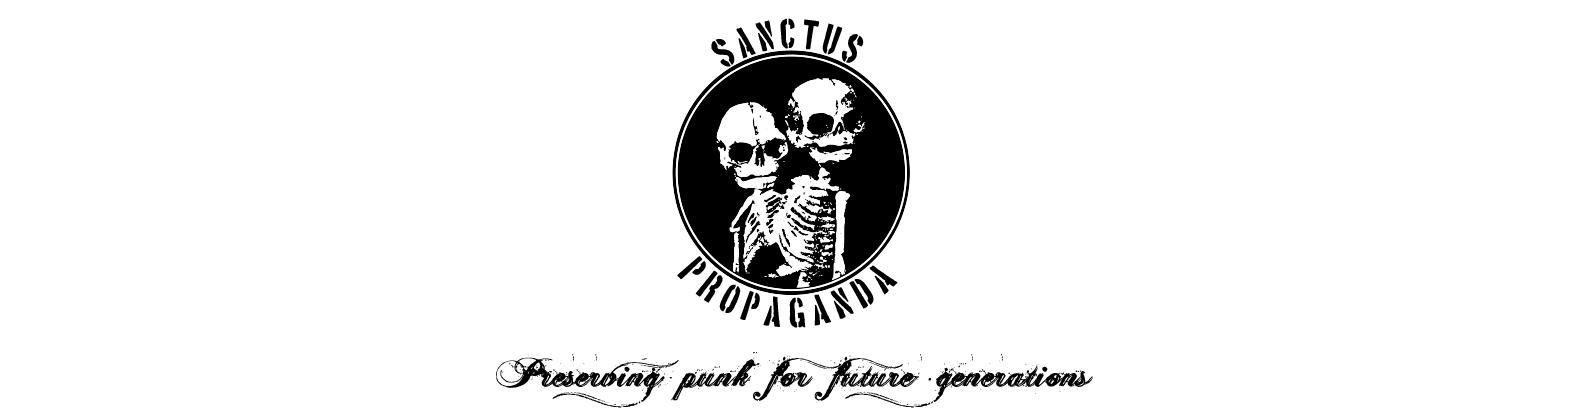 Sanctus Propaganda